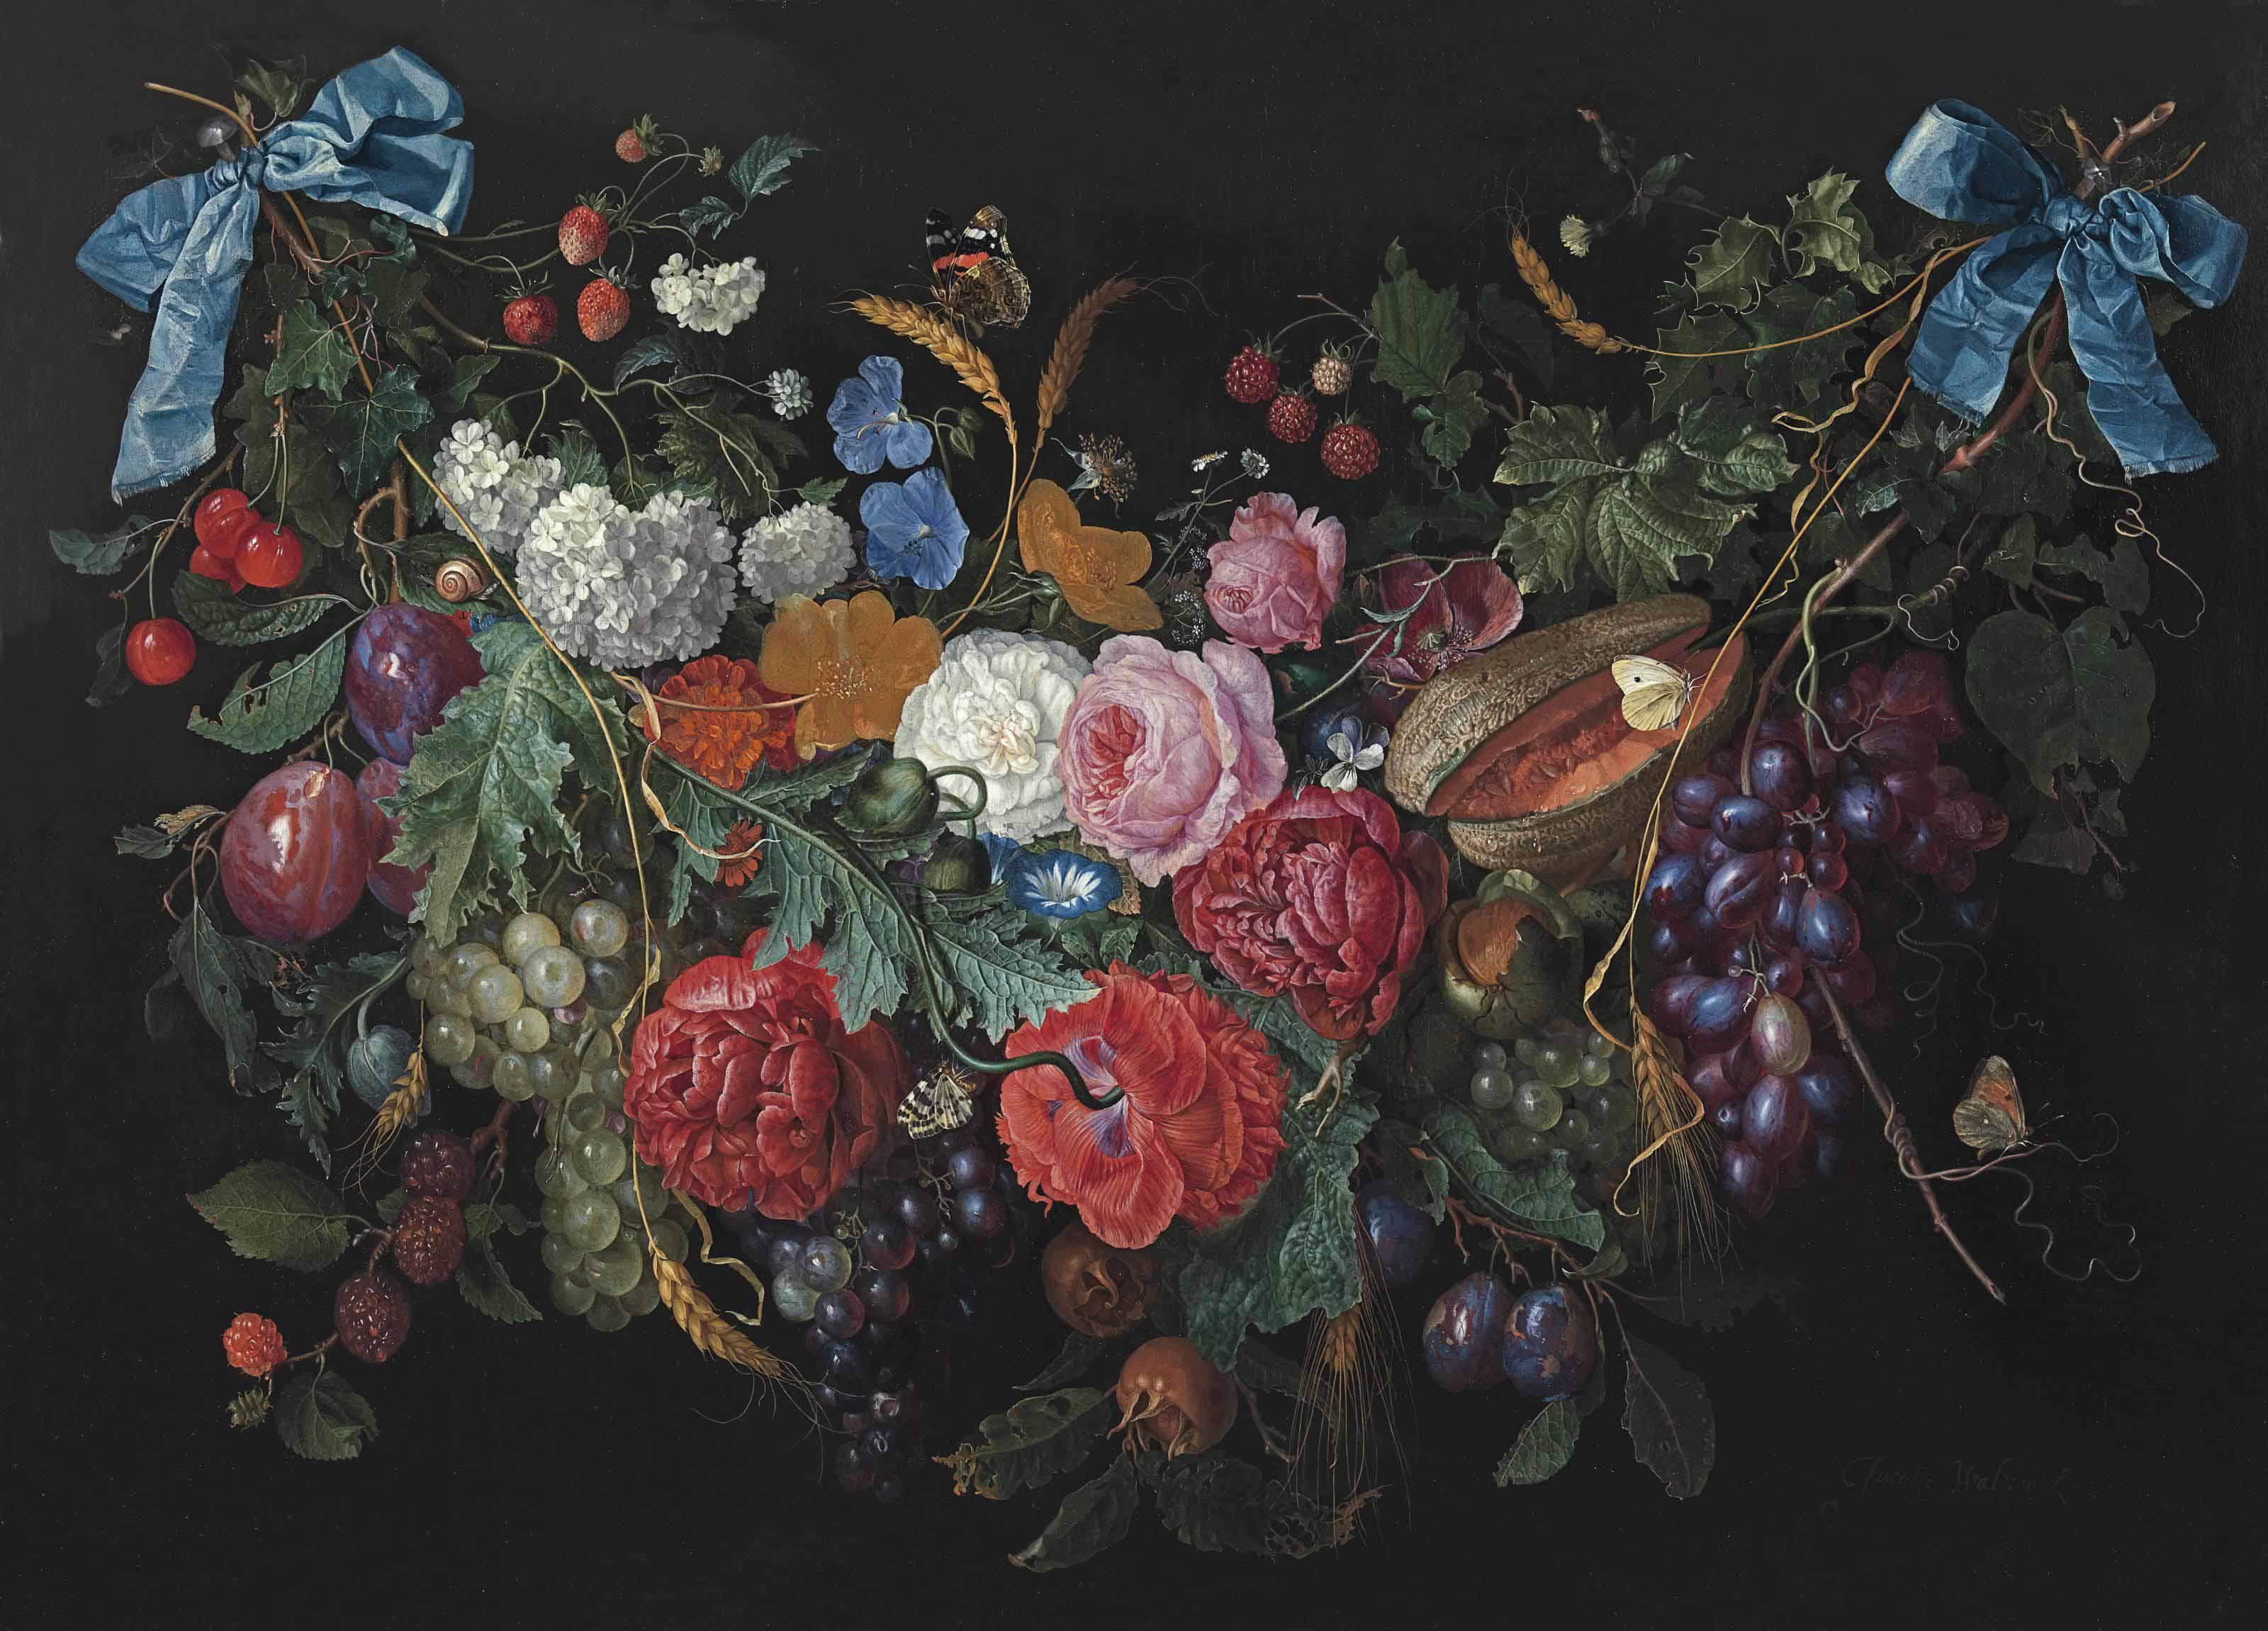 Jacob van Walscapelle (Dordrecht 1644-1727 Amsterdam)